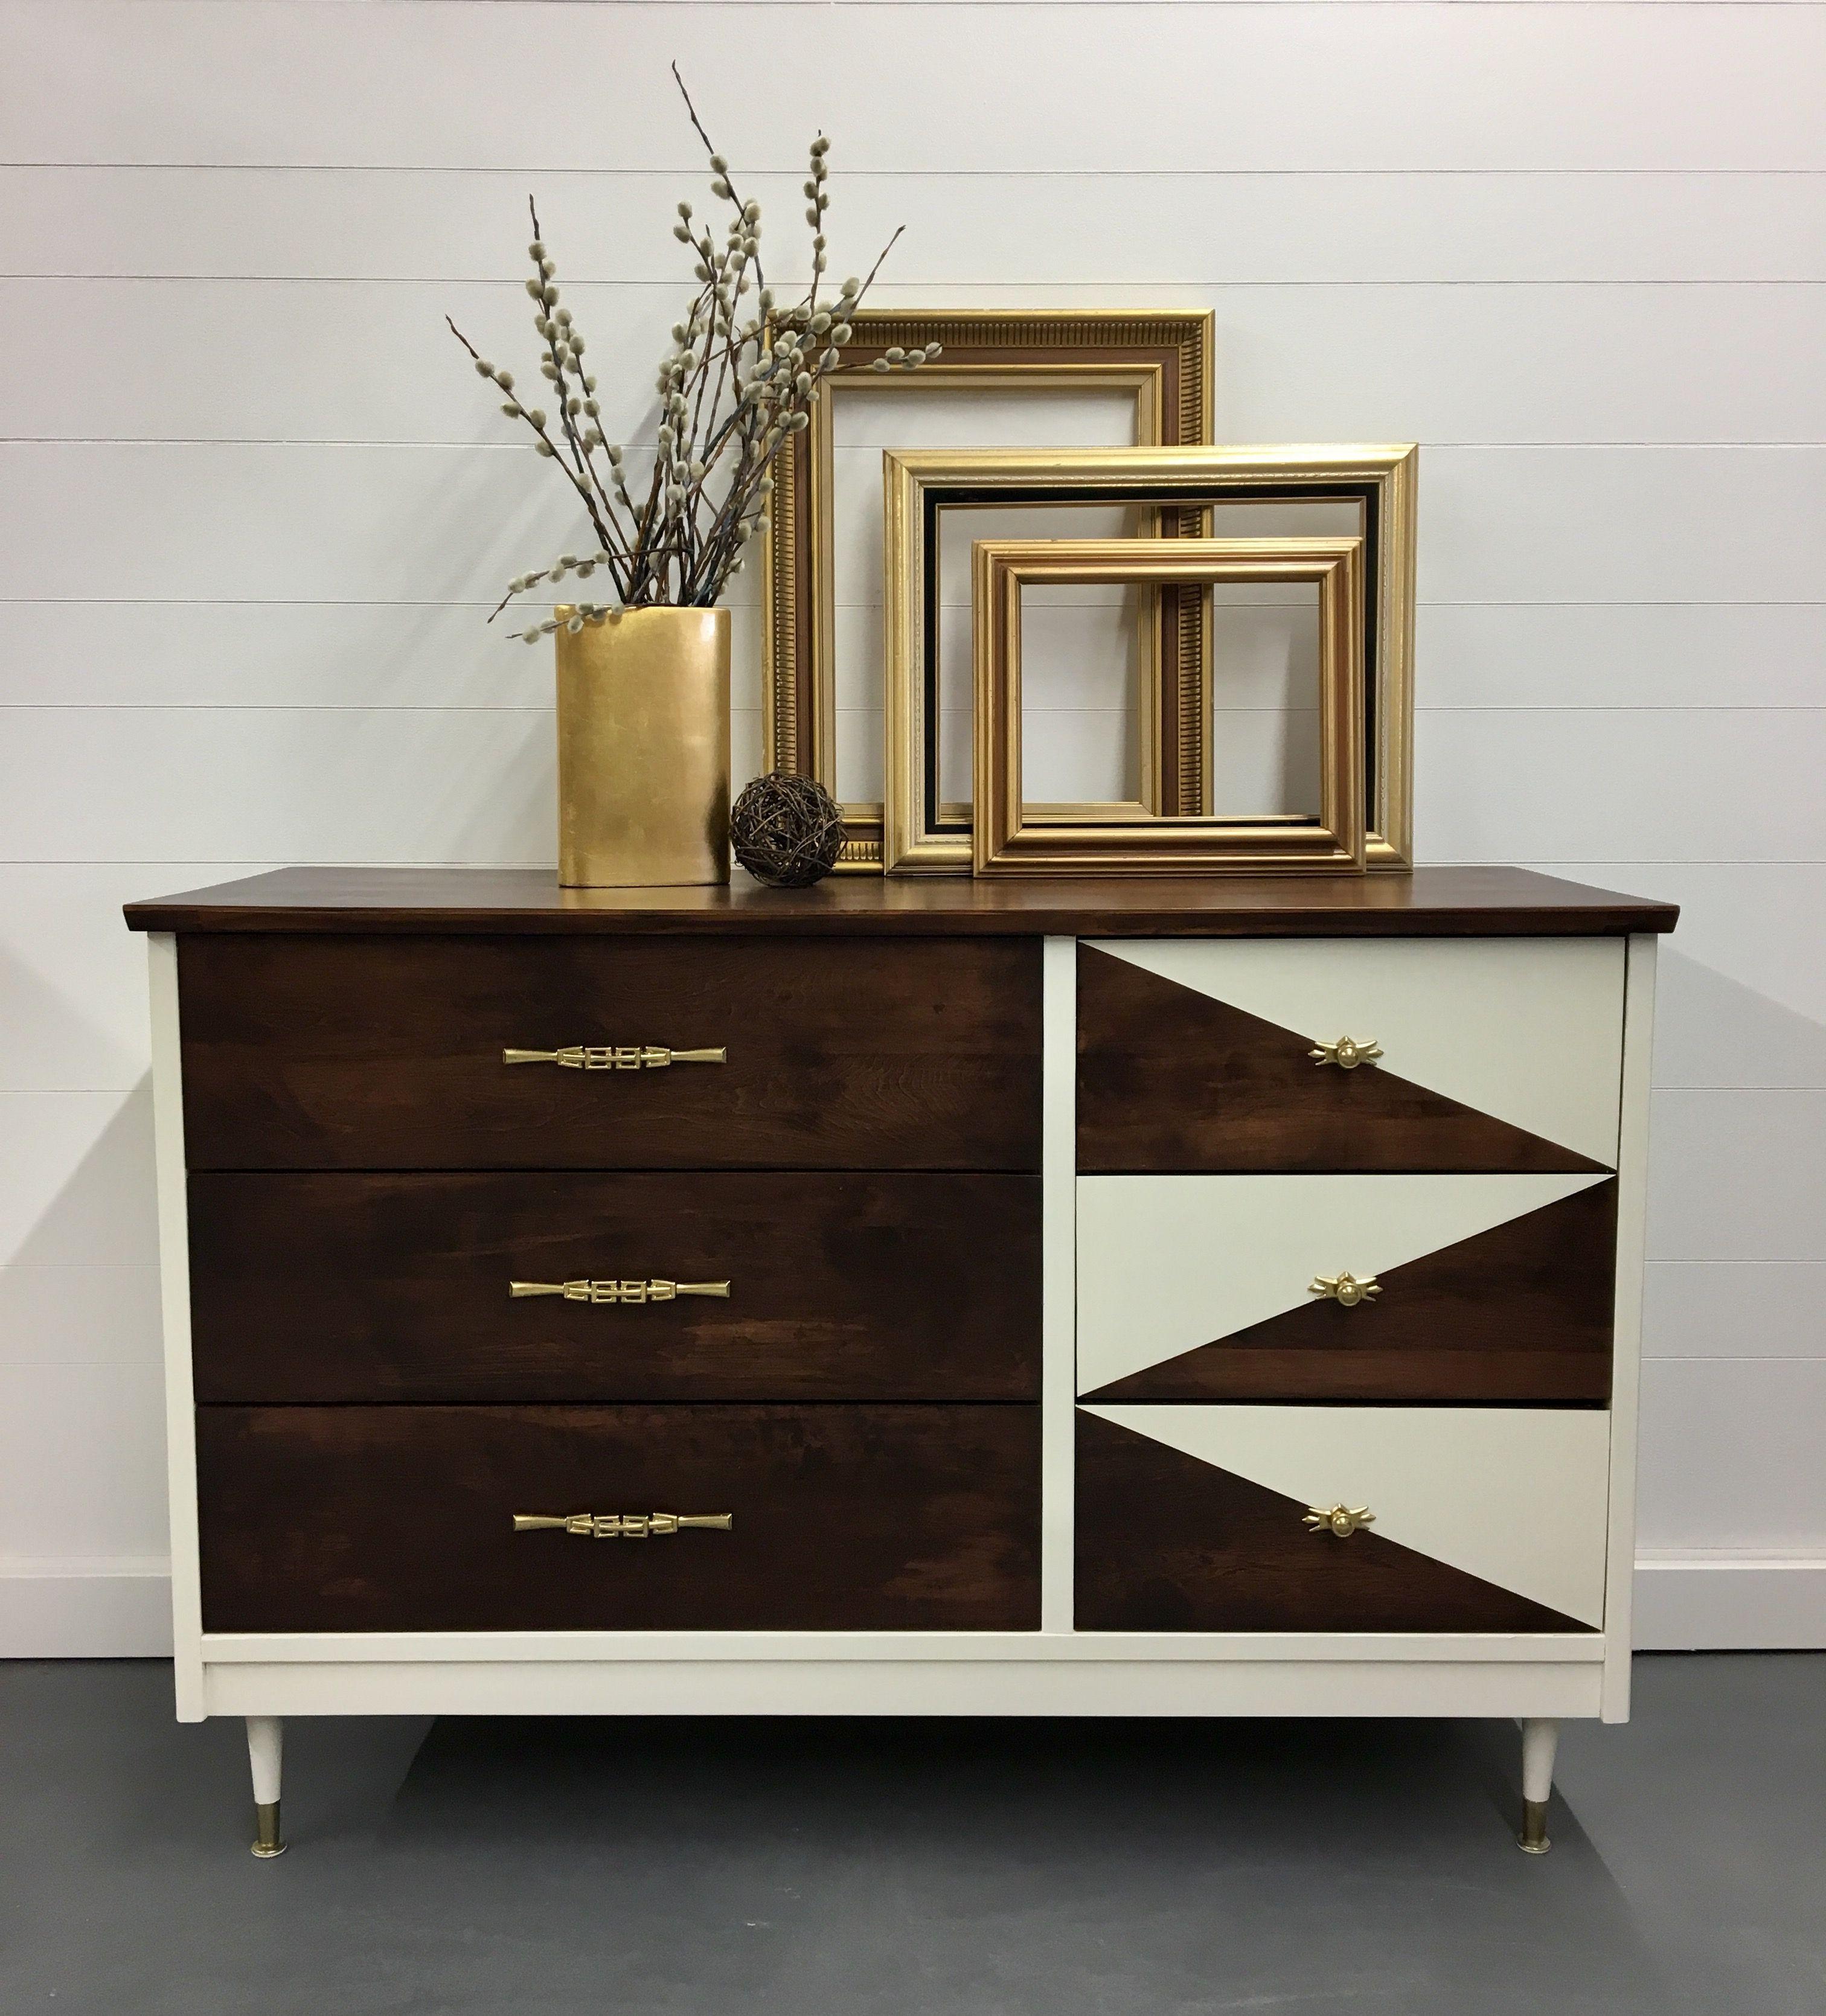 Wardrobe armoire - 25 shabby chic ideas for a romantic bedroom